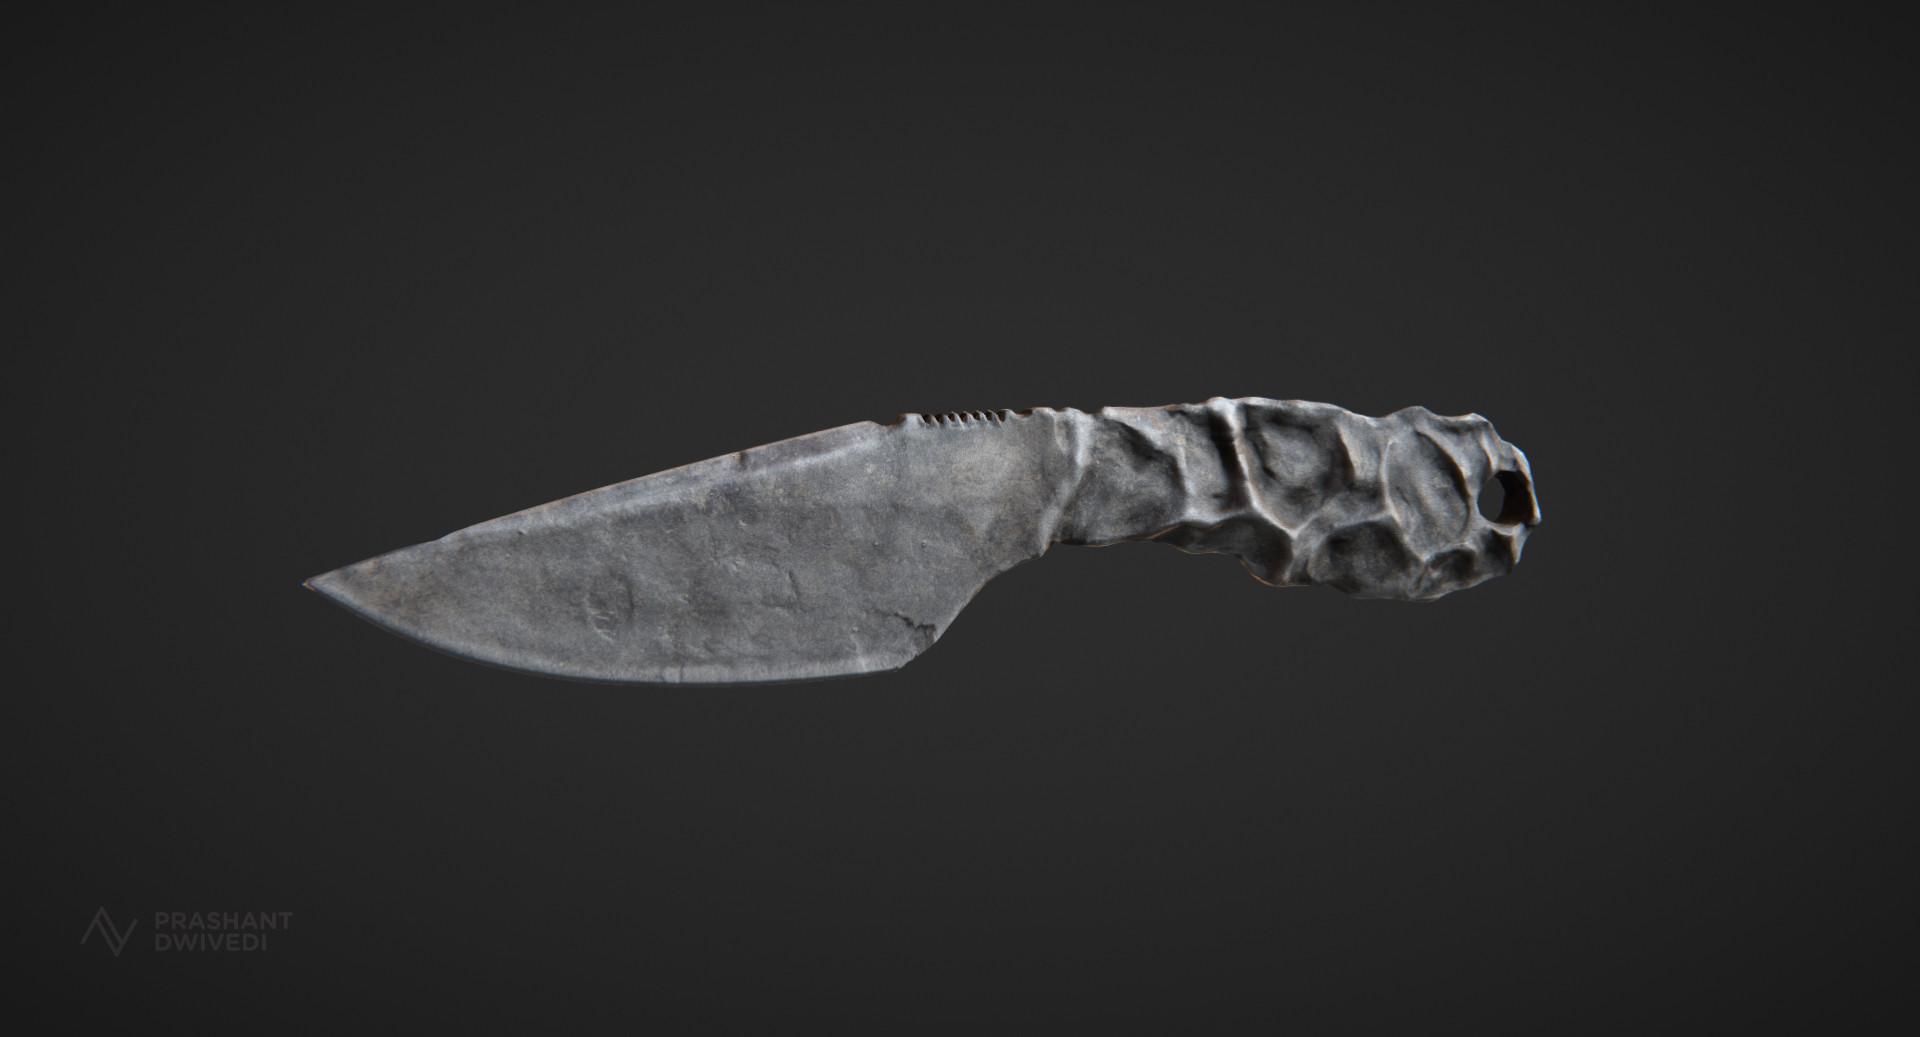 Prashant dwivedi stoneknife image 1